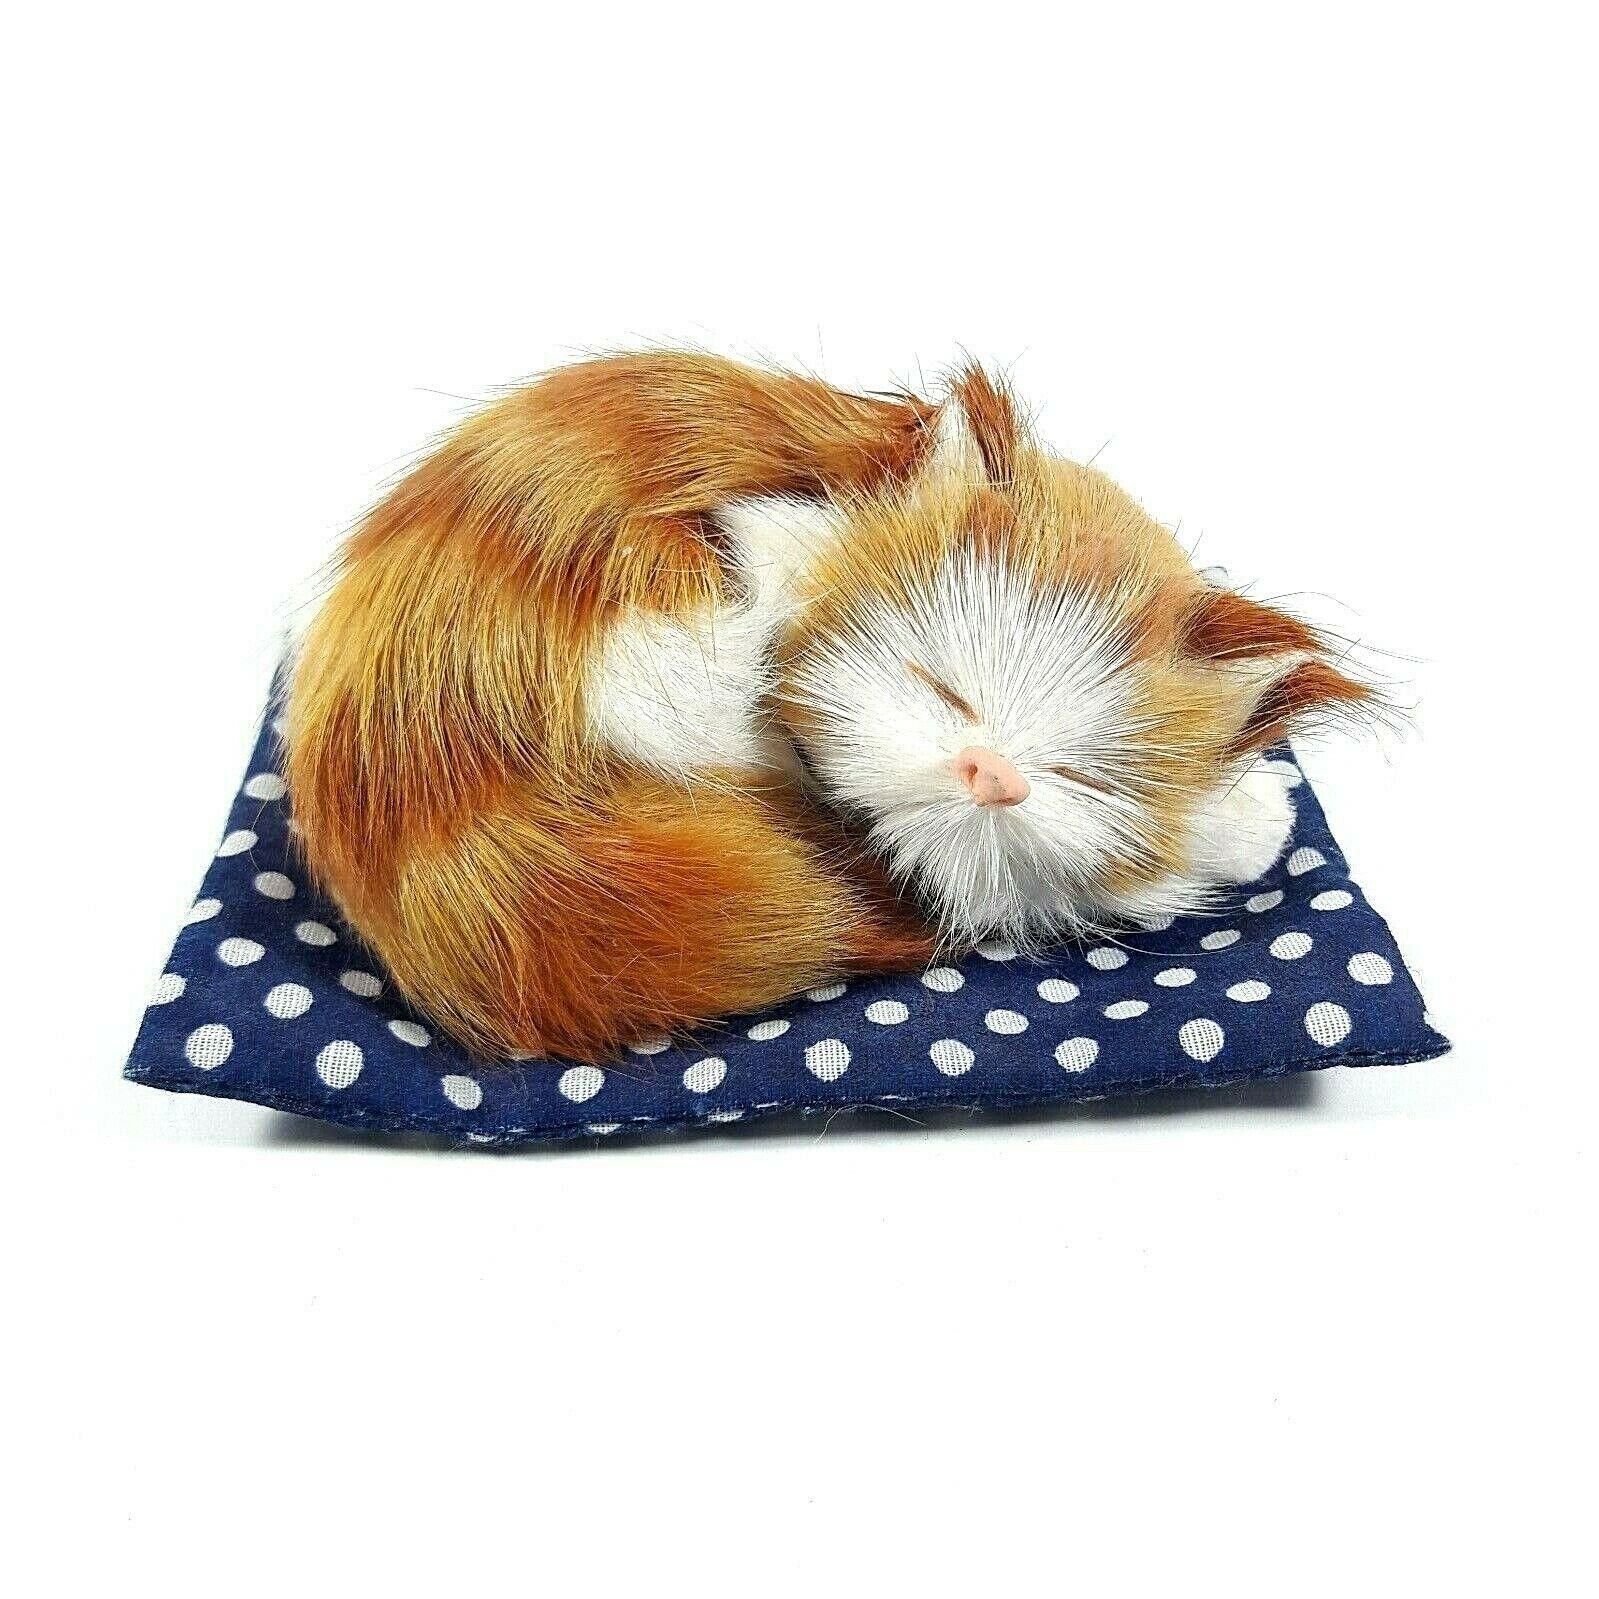 Realistic Fur Kitten Furry Soft Cat Sleeping On Mat Rug Animal Garfield Gift Ebay